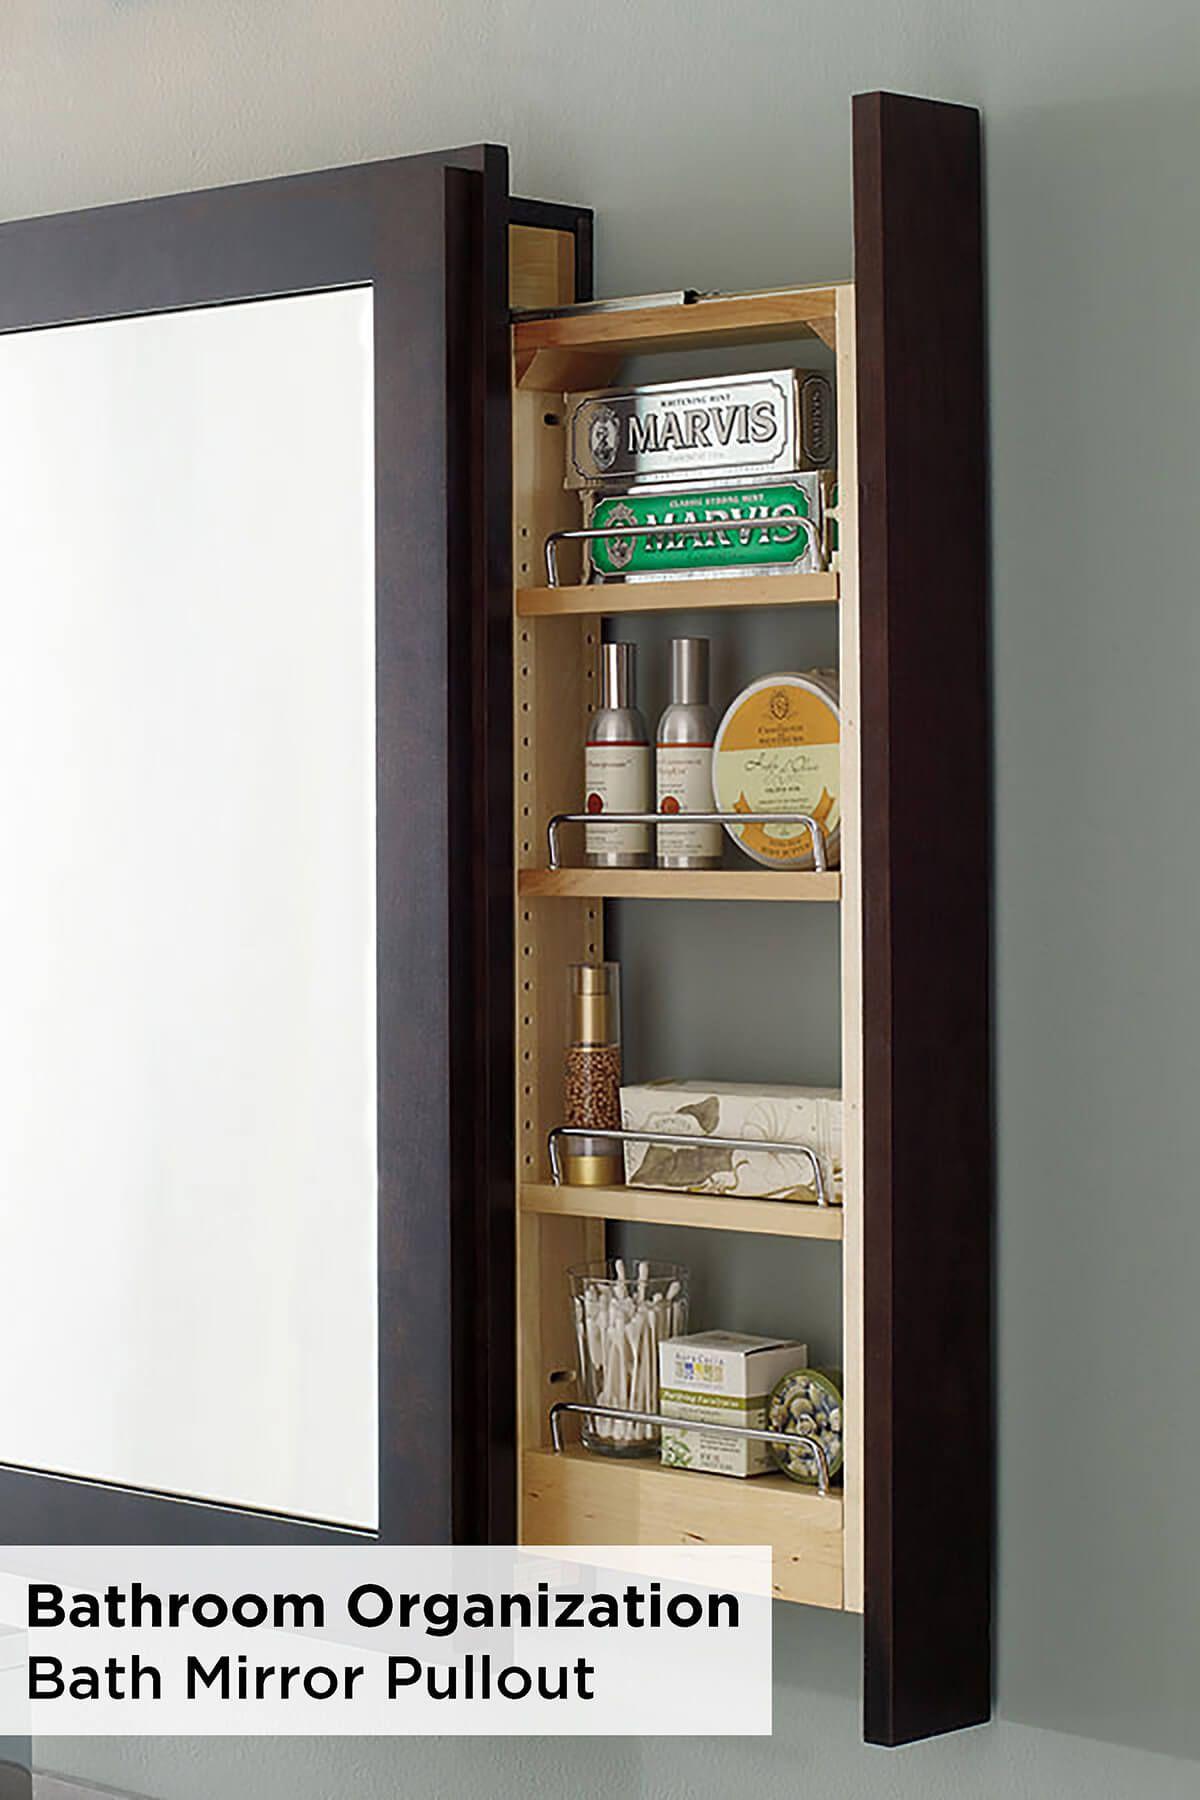 25 Brilliant Built In Bathroom Shelf And Storage Ideas To Keep You Organized With Style Bath Mirror Bathroom Mirror Makeover Bathroom Storage Shelves